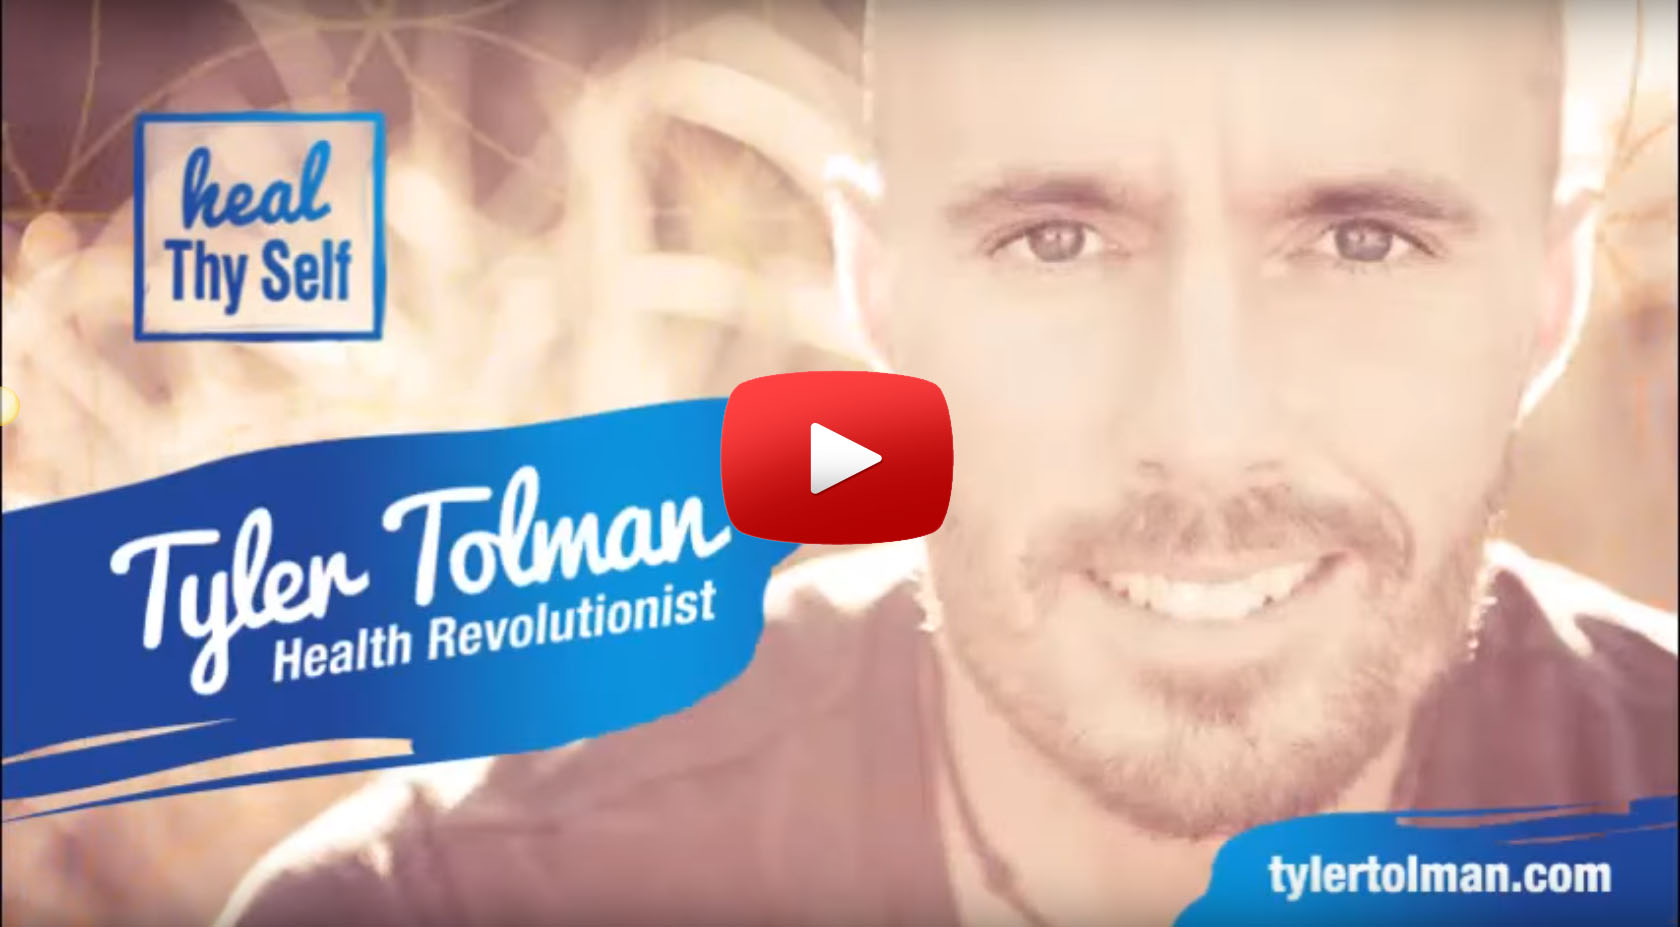 Tyler Tolman l ConsciousLifestyler